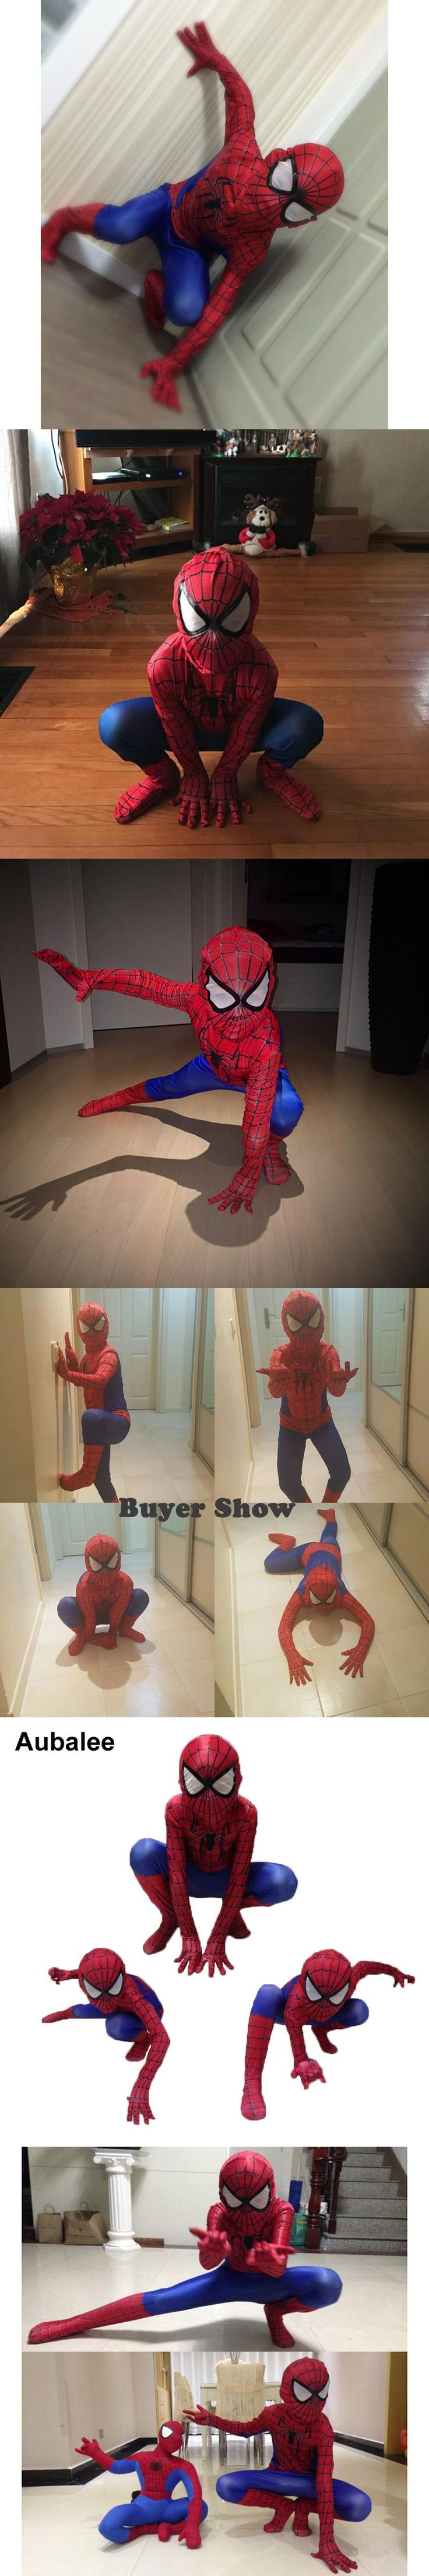 Kids Spiderman Costume Child Superhero Cosplay Elastic Jumpsuit Amazing Spiderman Spandex Zentai Suit Halloween boys Costumes